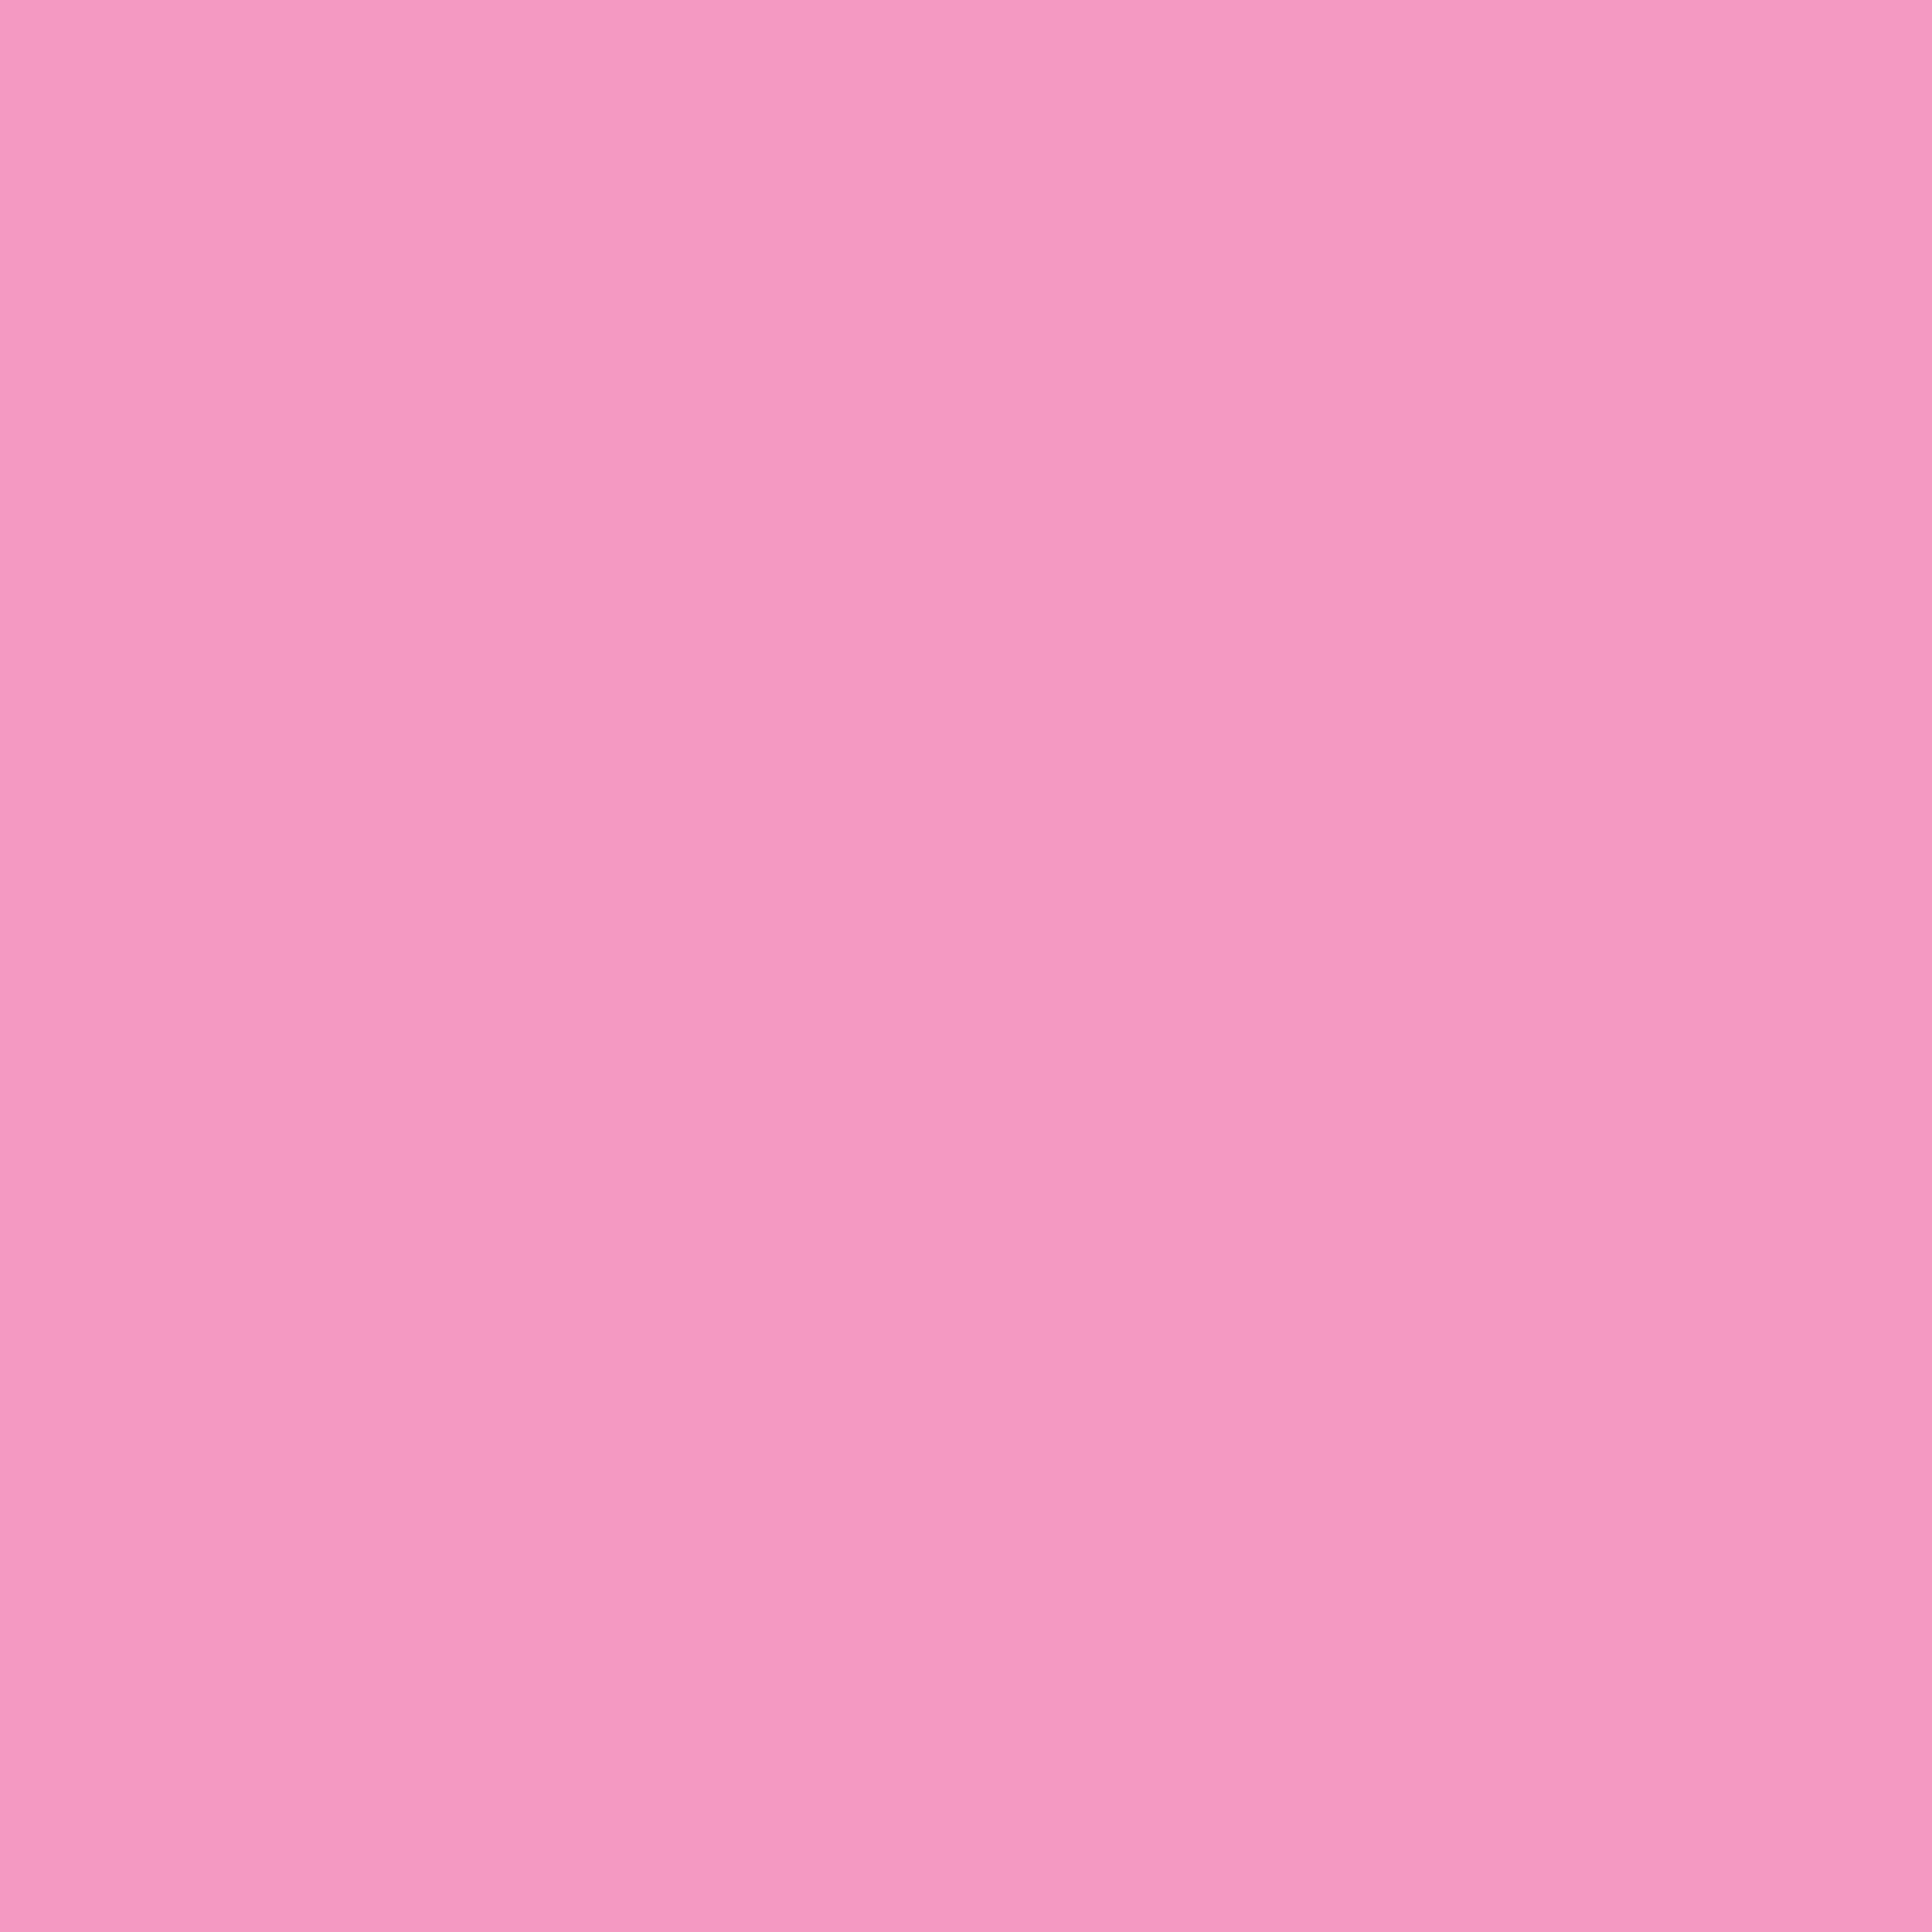 3600x3600 Pastel Magenta Solid Color Background